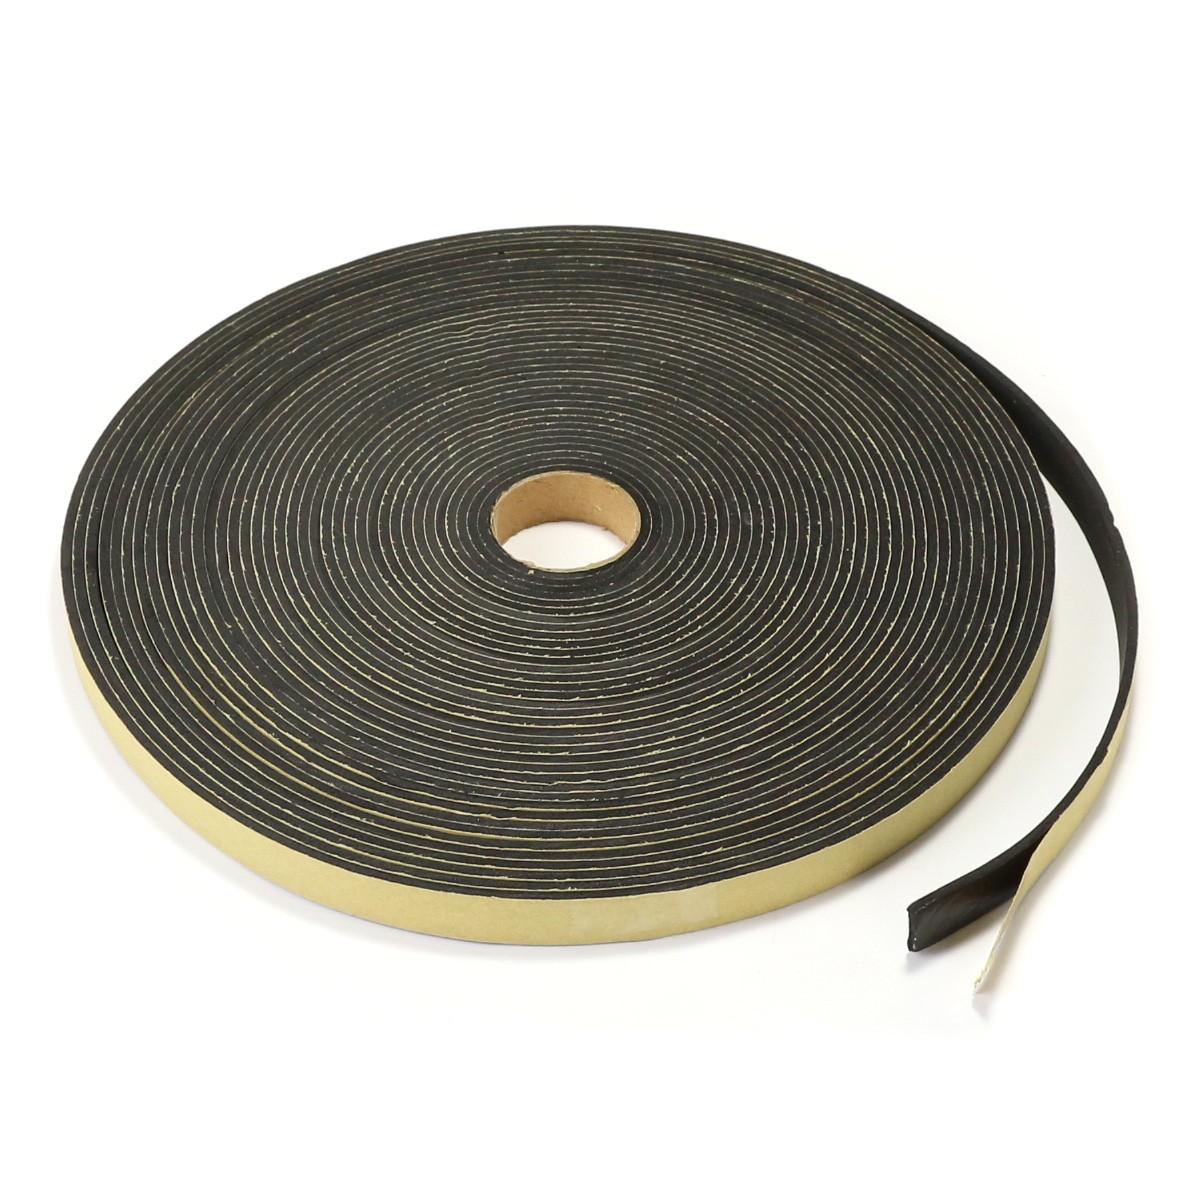 EVA Gasket for Speakers 20x3mm Black